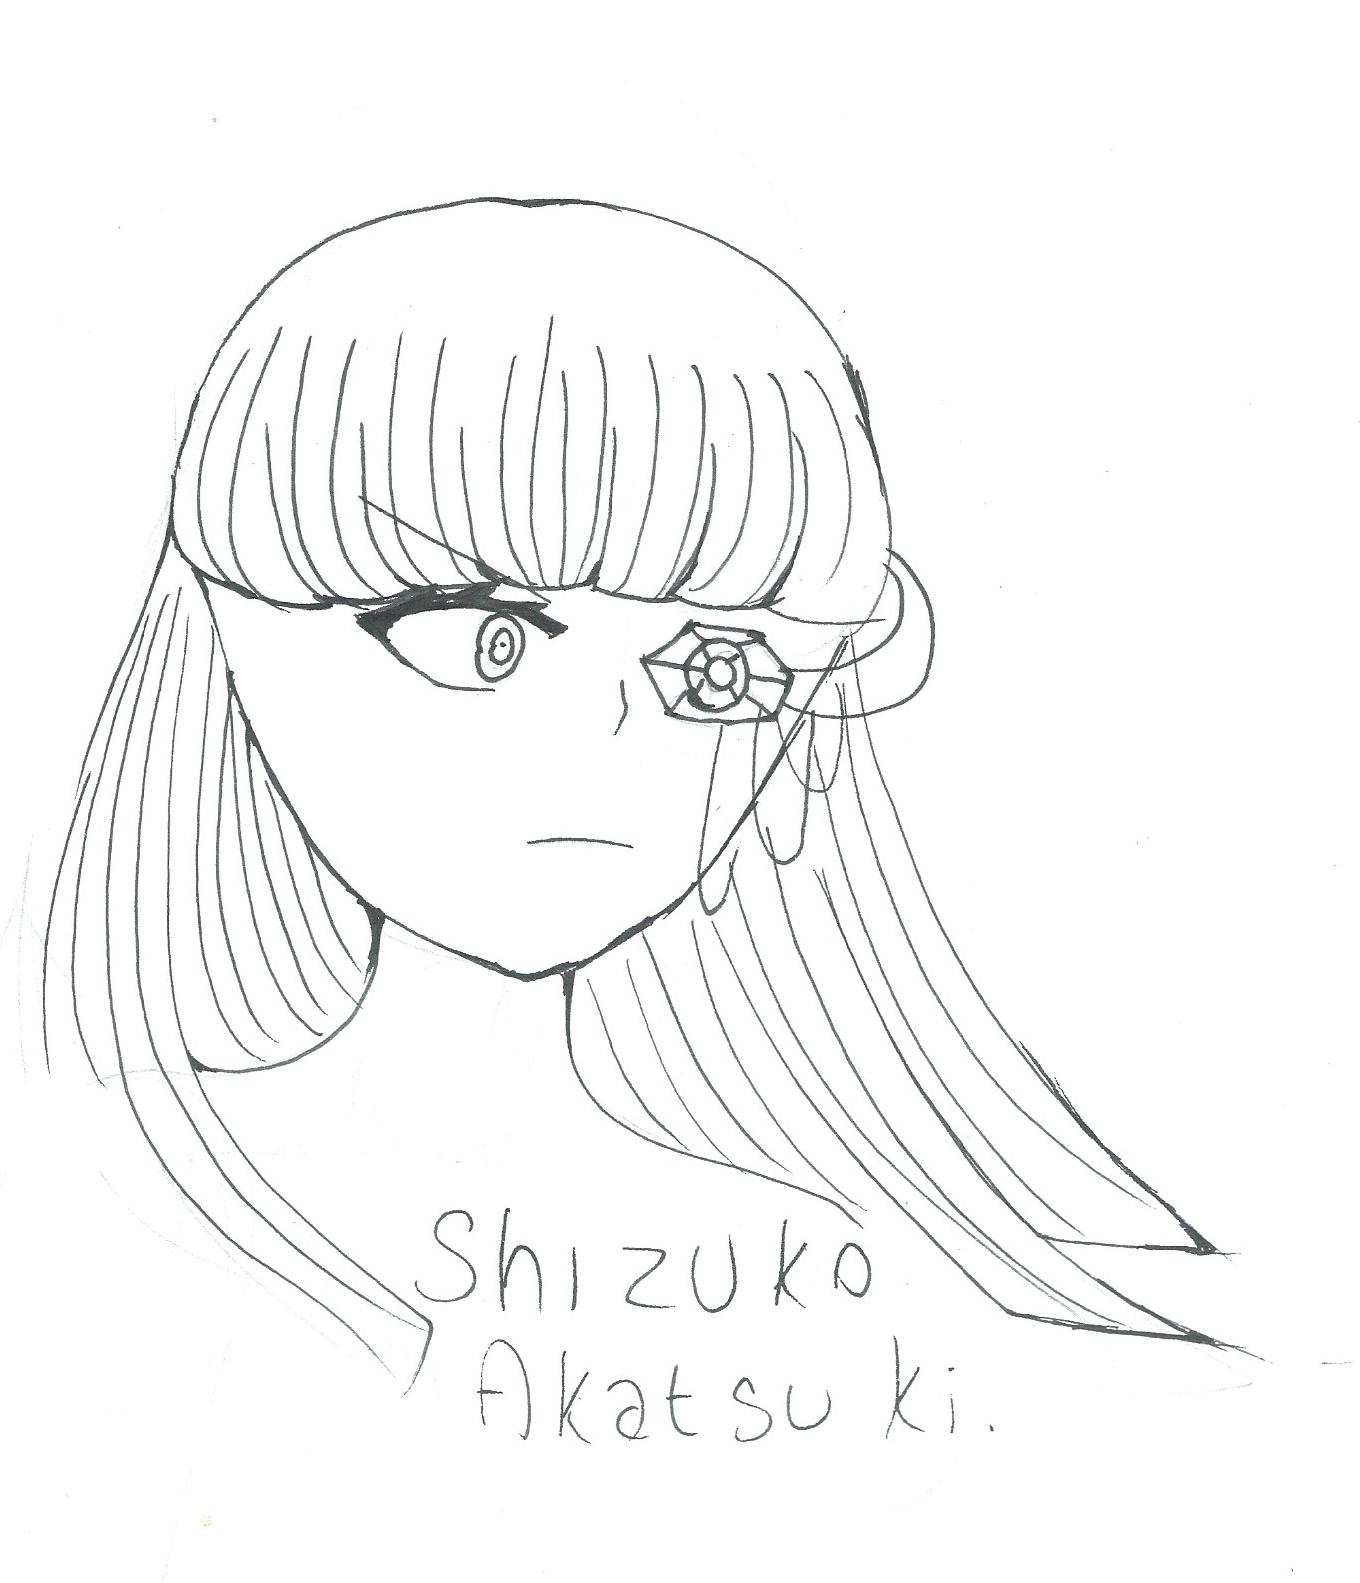 [Inktober] Day 24 : Cyborg by Shizuko-Akatsuki